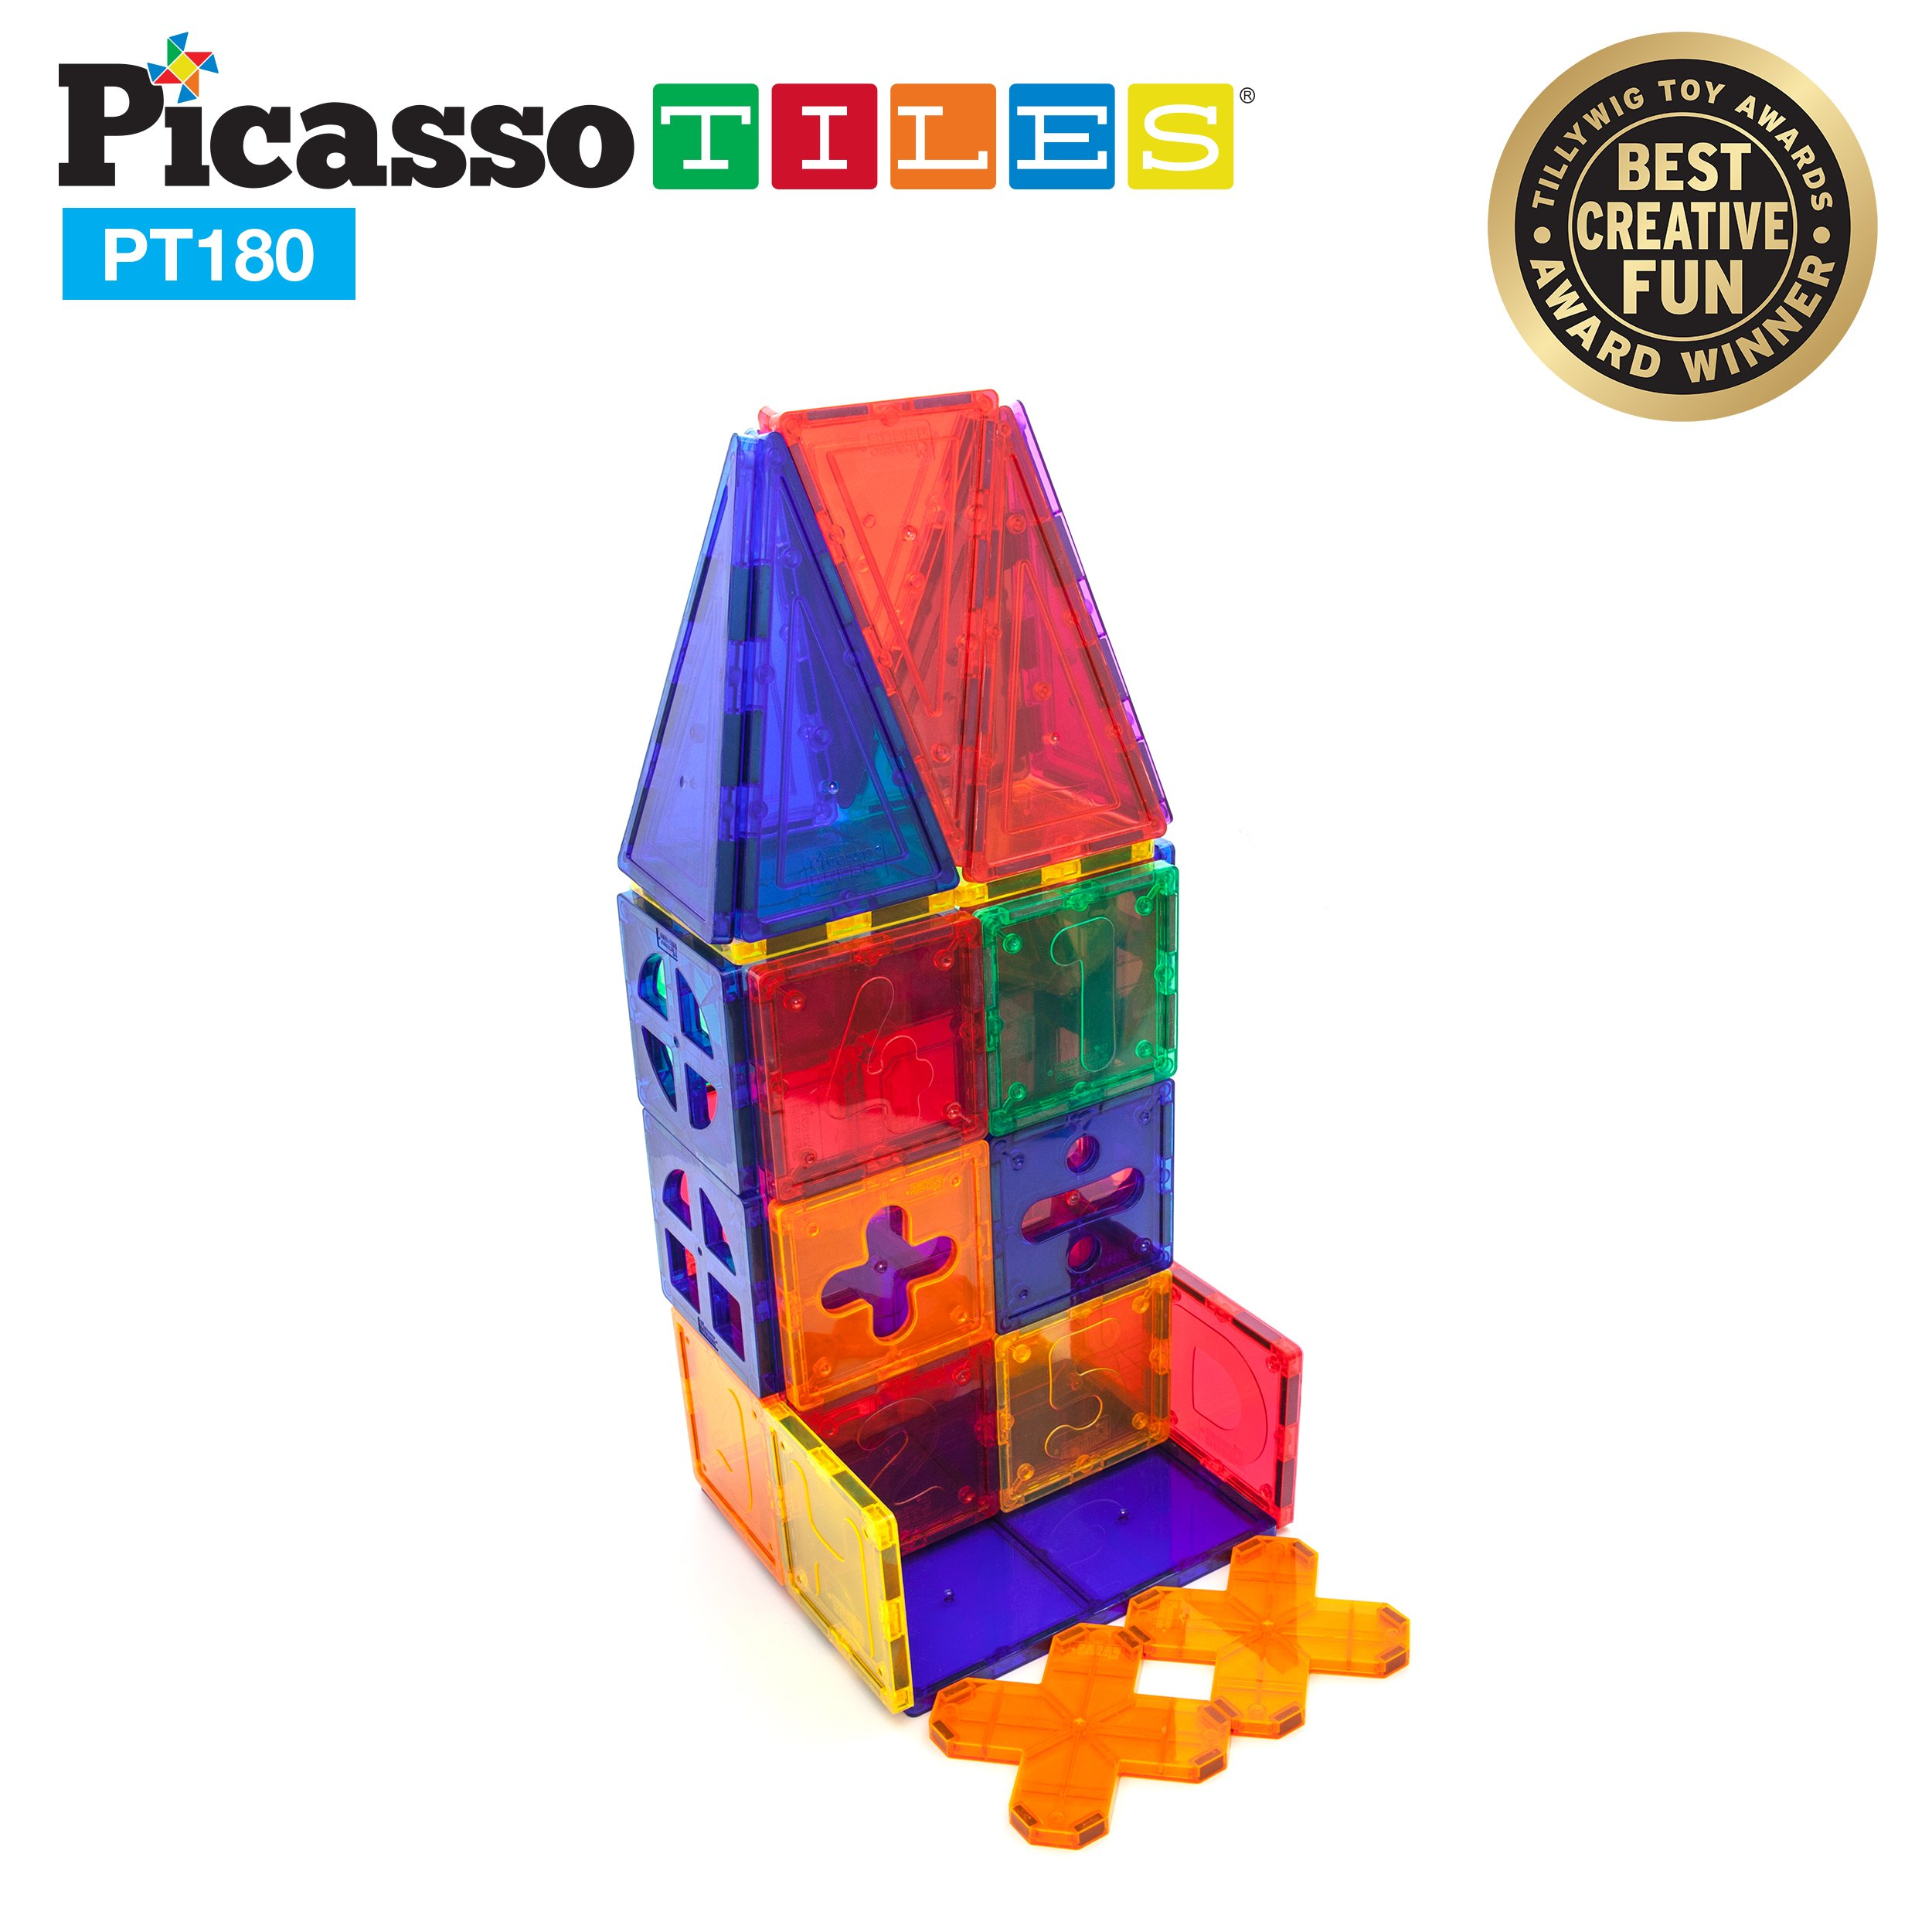 PicassoTiles PT180 Piece Set 180pc Building Block Toy Deluxe Construction Kit Magnet Building Tiles Clear Color Magnetic 3D Construction Playboards Educational Blocks Creativity Beyond Imagination by PicassoTiles (Image #4)